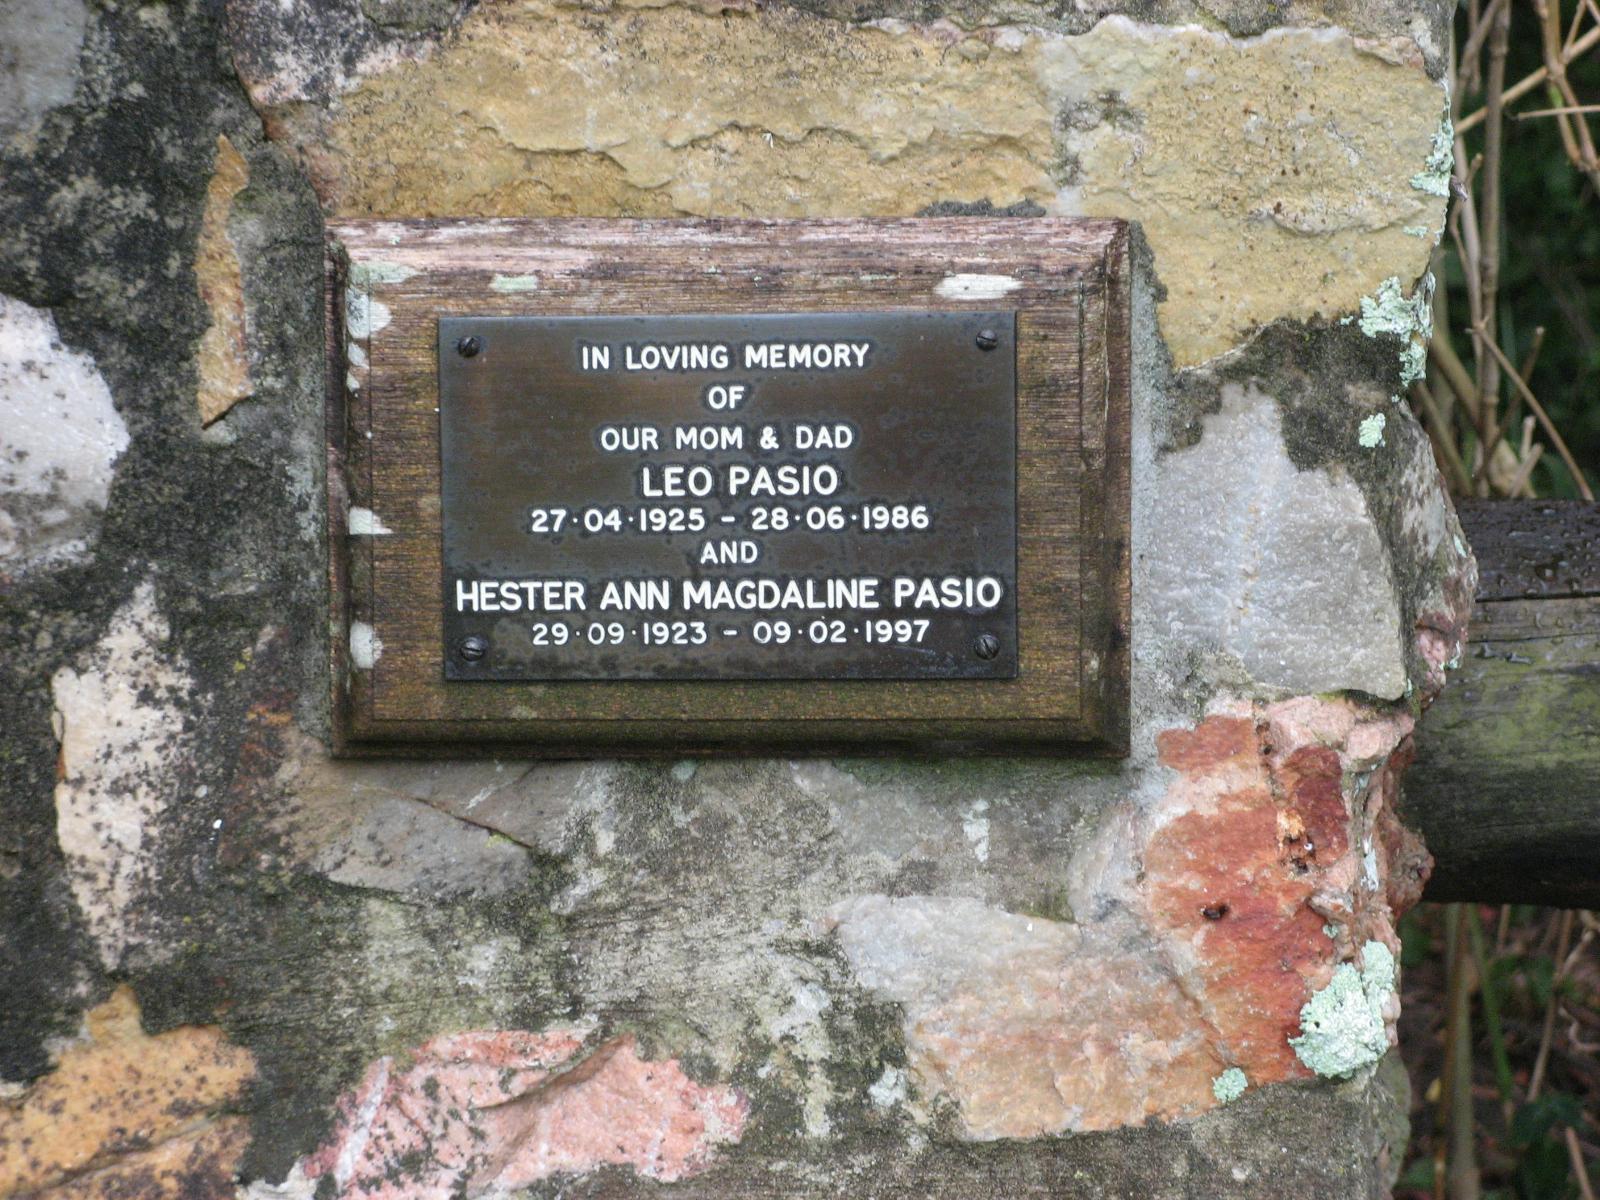 Pasio, Leo + Pasio, Hester Ann Magdaline